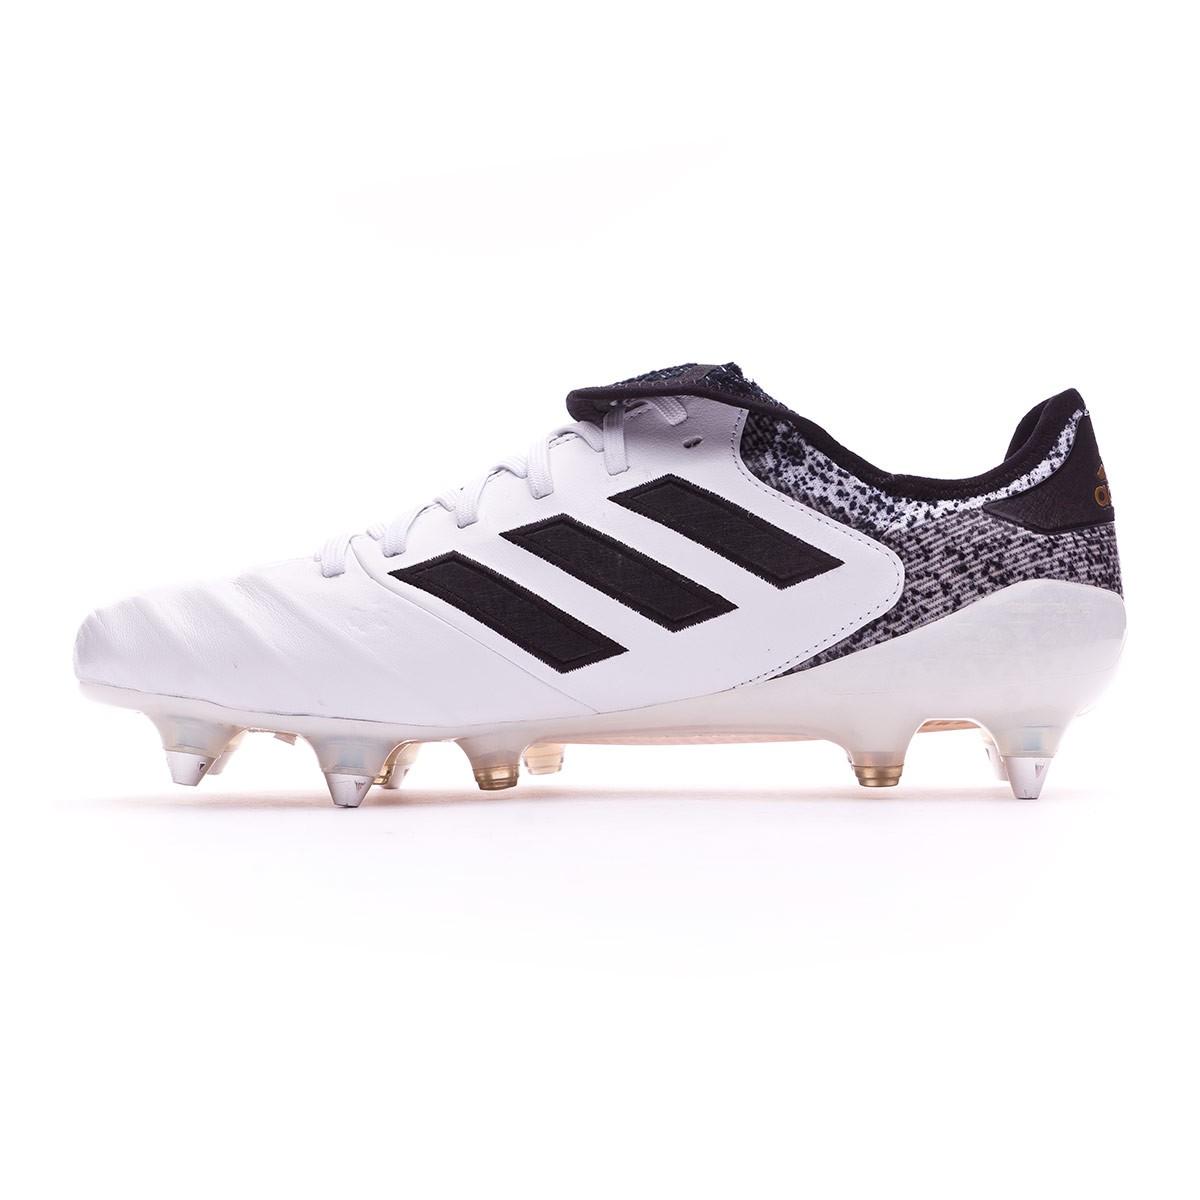 6d7783132d81 Football Boots adidas Copa 18.1 SG White-Core black-Tactile gold metallic -  Tienda de fútbol Fútbol Emotion